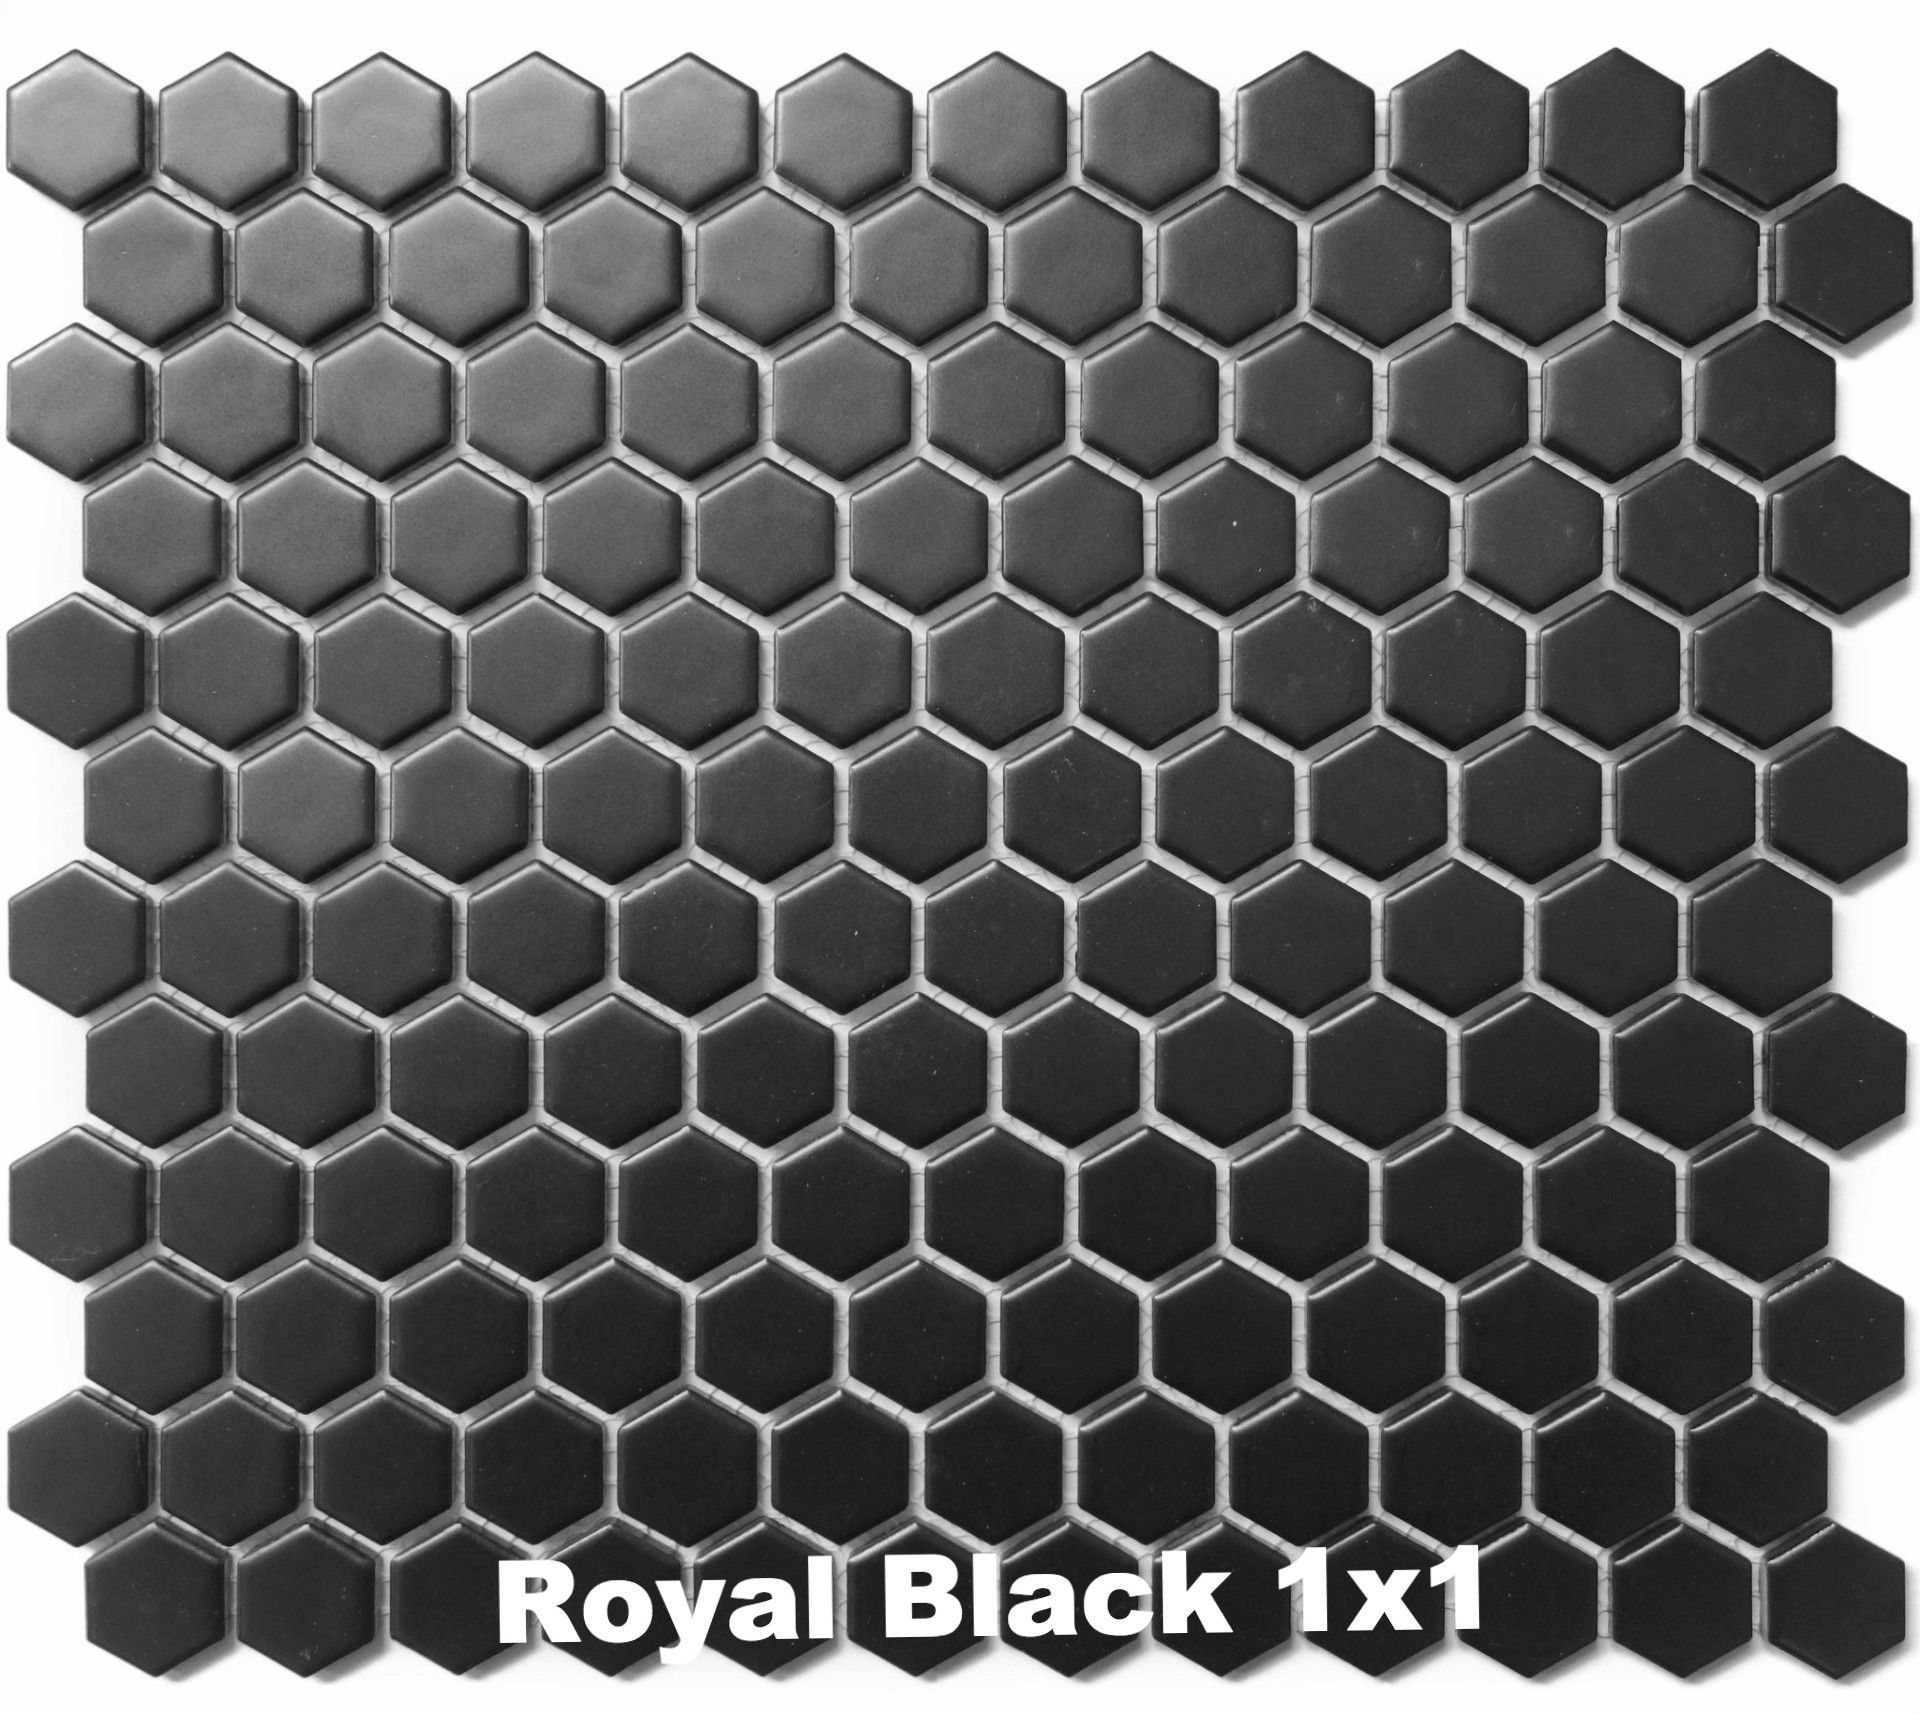 Royal Black 1x1 Matte Hexagon Mosaics Hexagonal Mosaic Porcelain Mosaic Porcelain Mosaic Tile